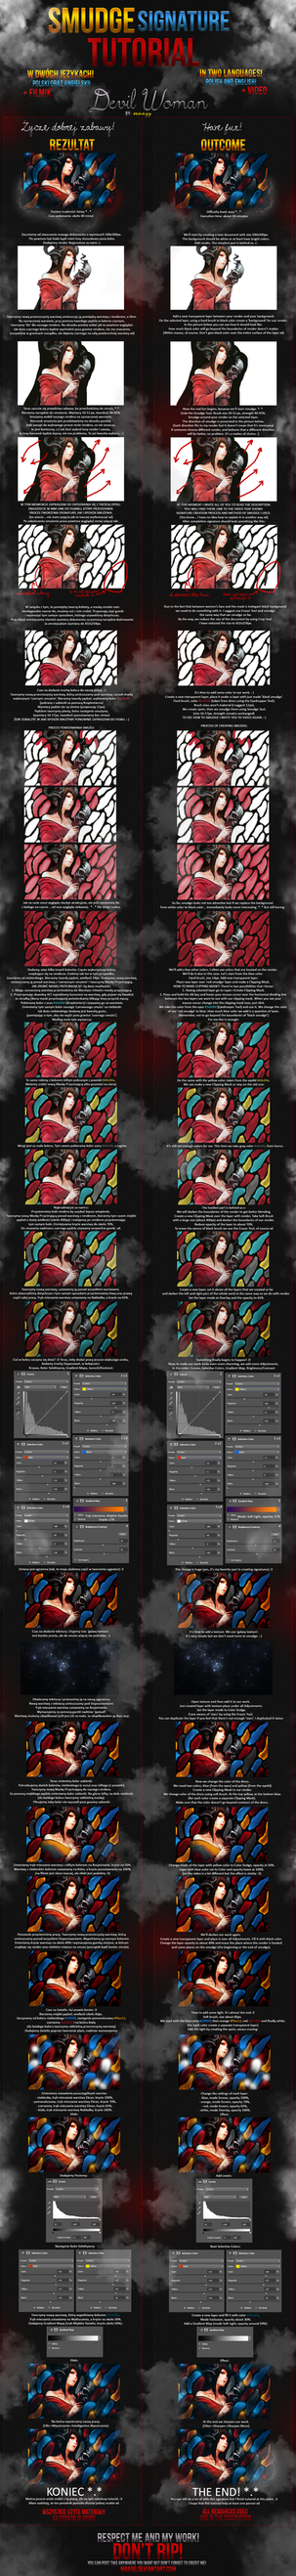 devil_woman_signature___smudge_tutorial_